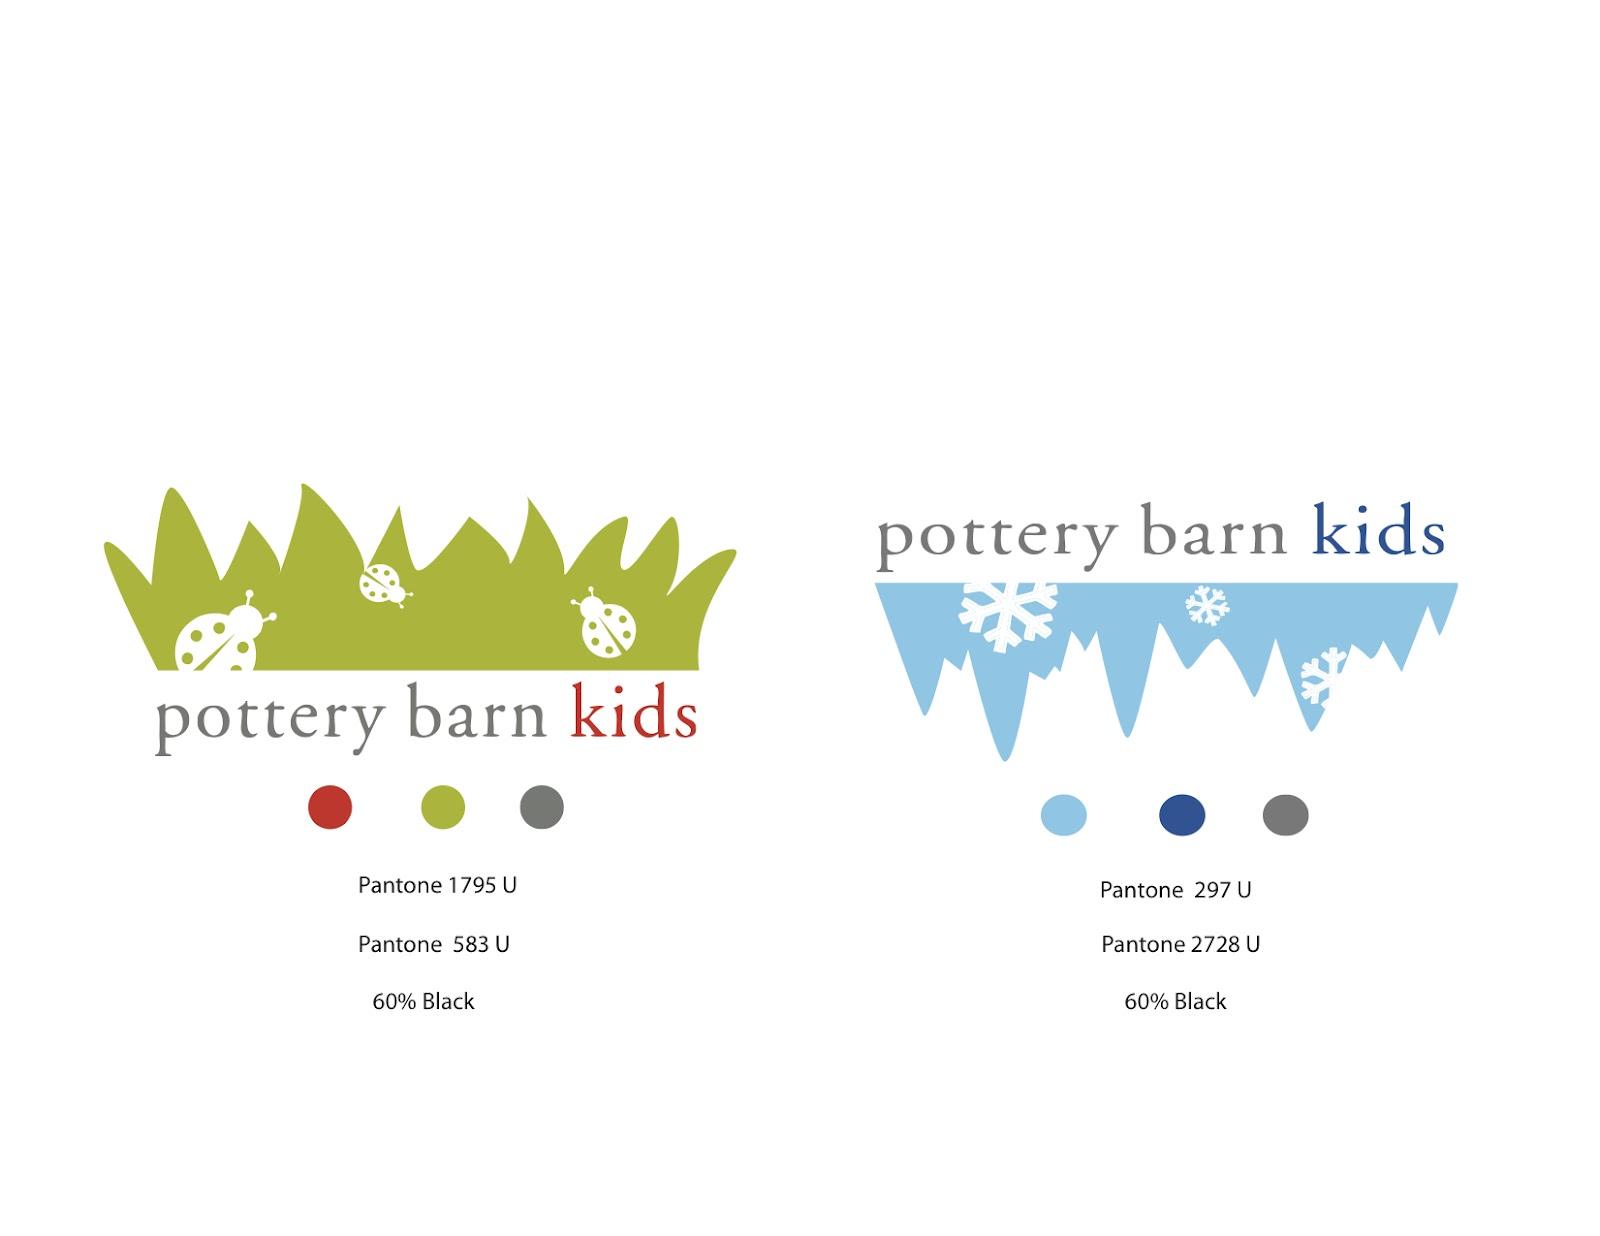 POTTERY BARN KIDS LOGO AN ONLINE PORTFOLIO FOR KASS GROSS